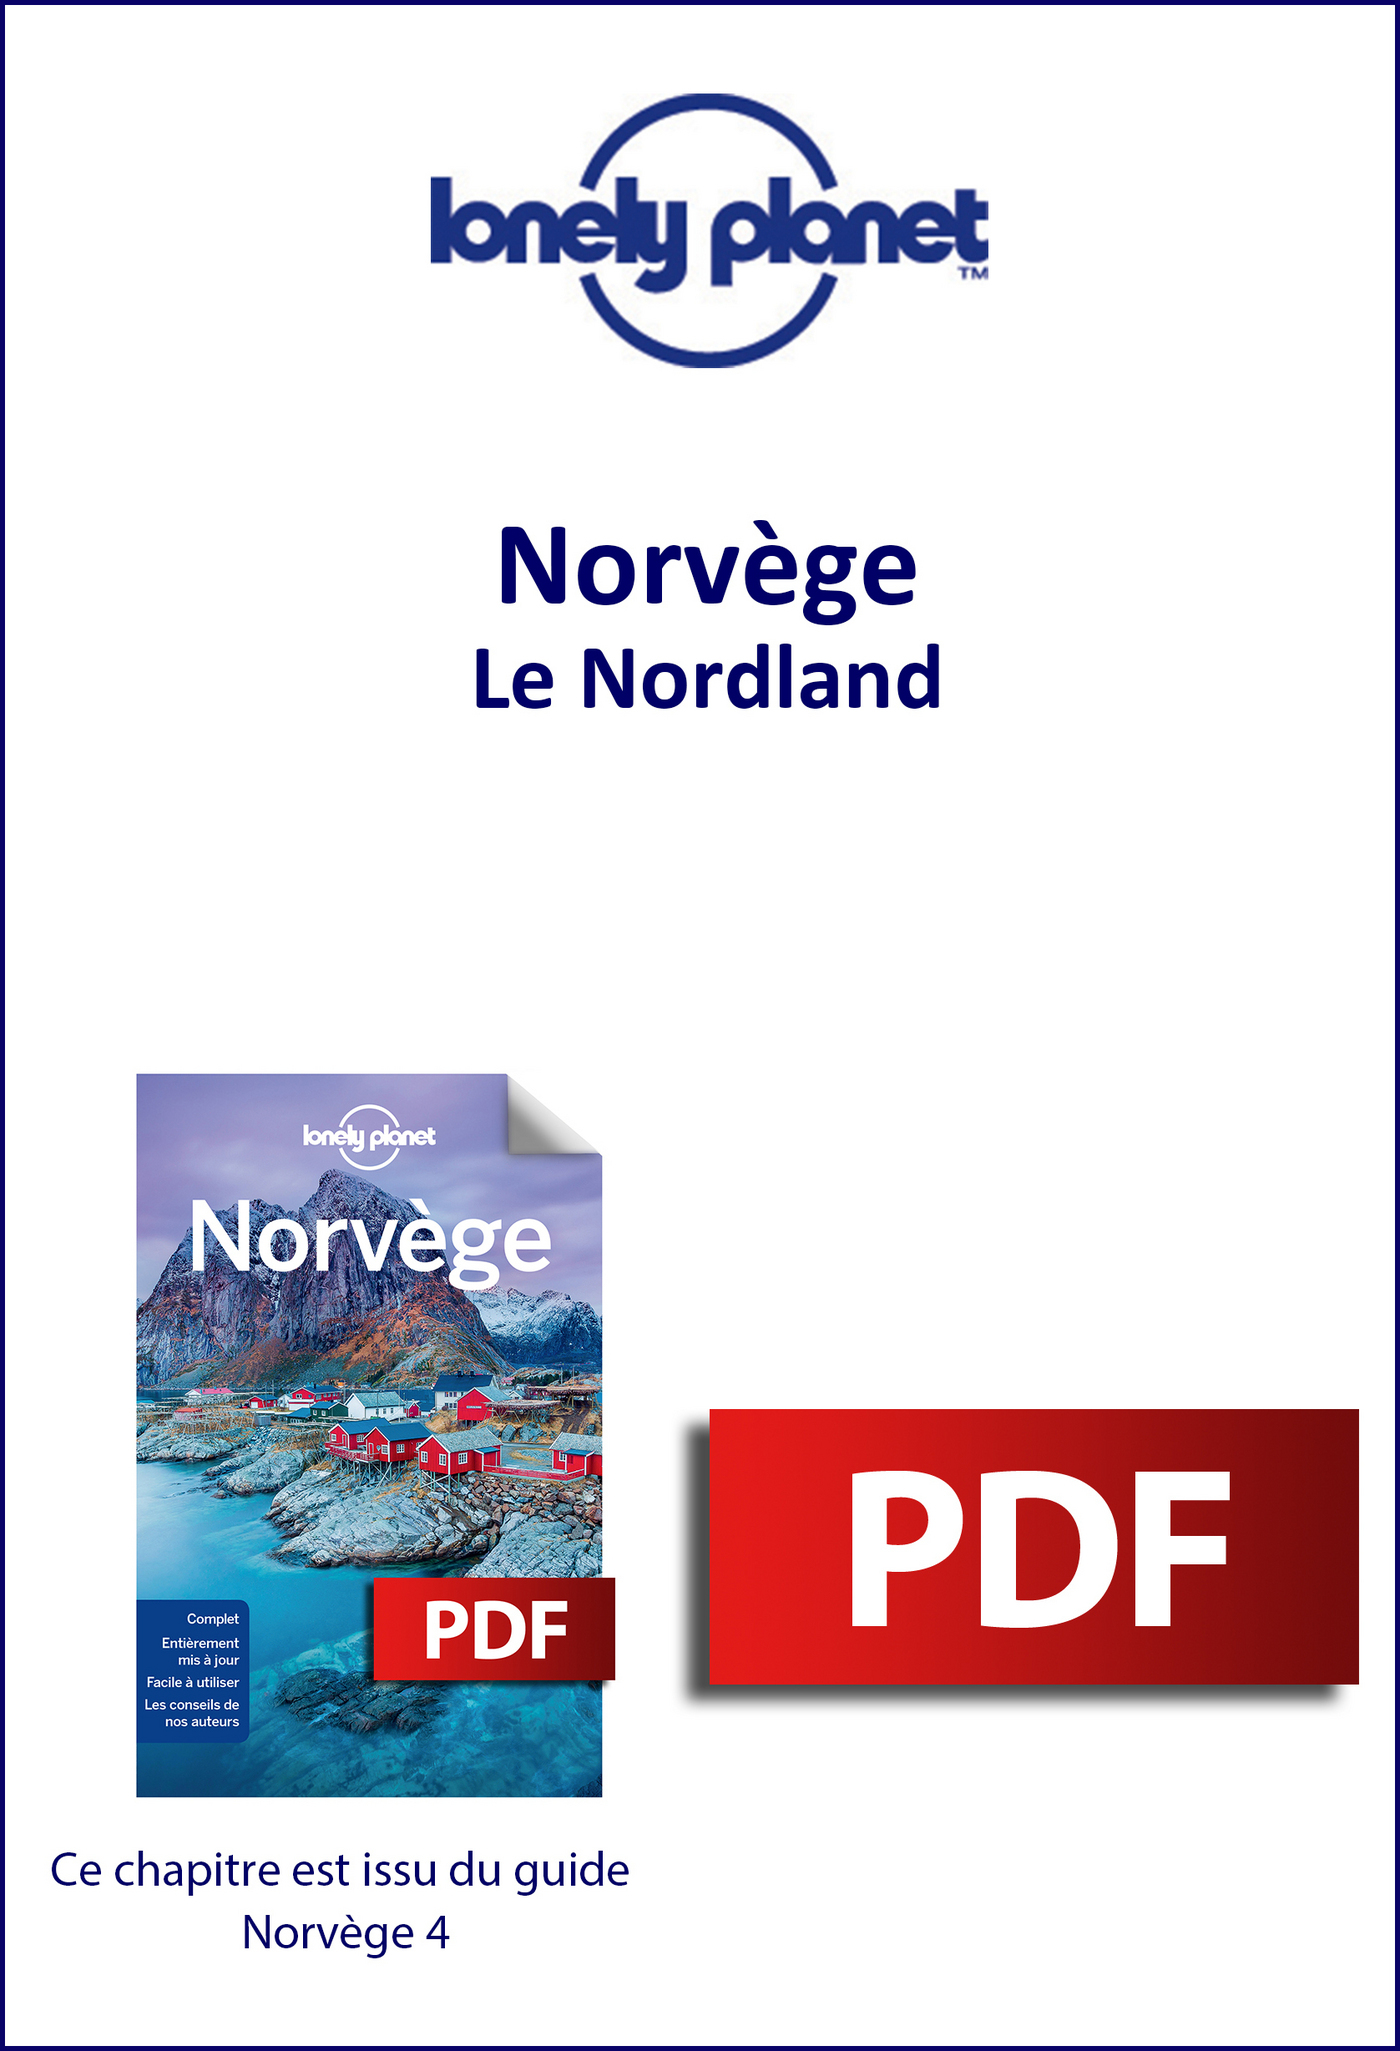 Norvège - Le Nordland